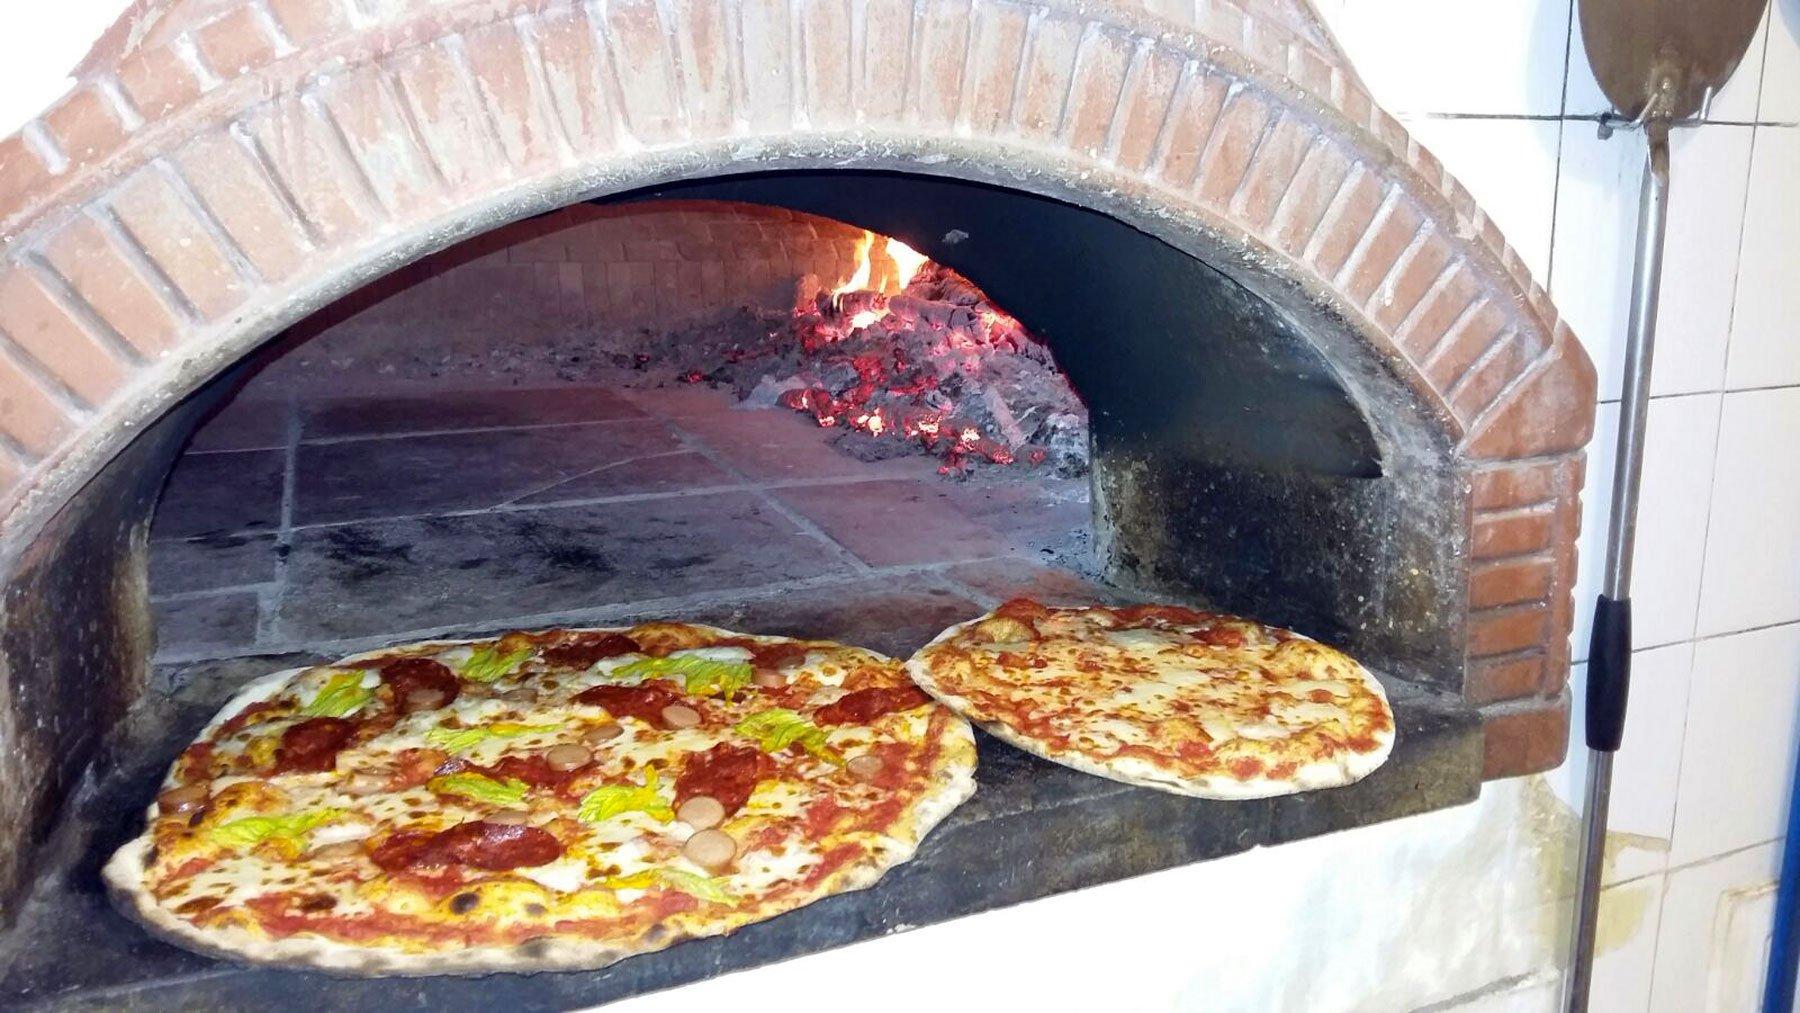 Forno a  legna, pizza gigante con salame e wurstel e Pizza margherita a Sarzana, SP